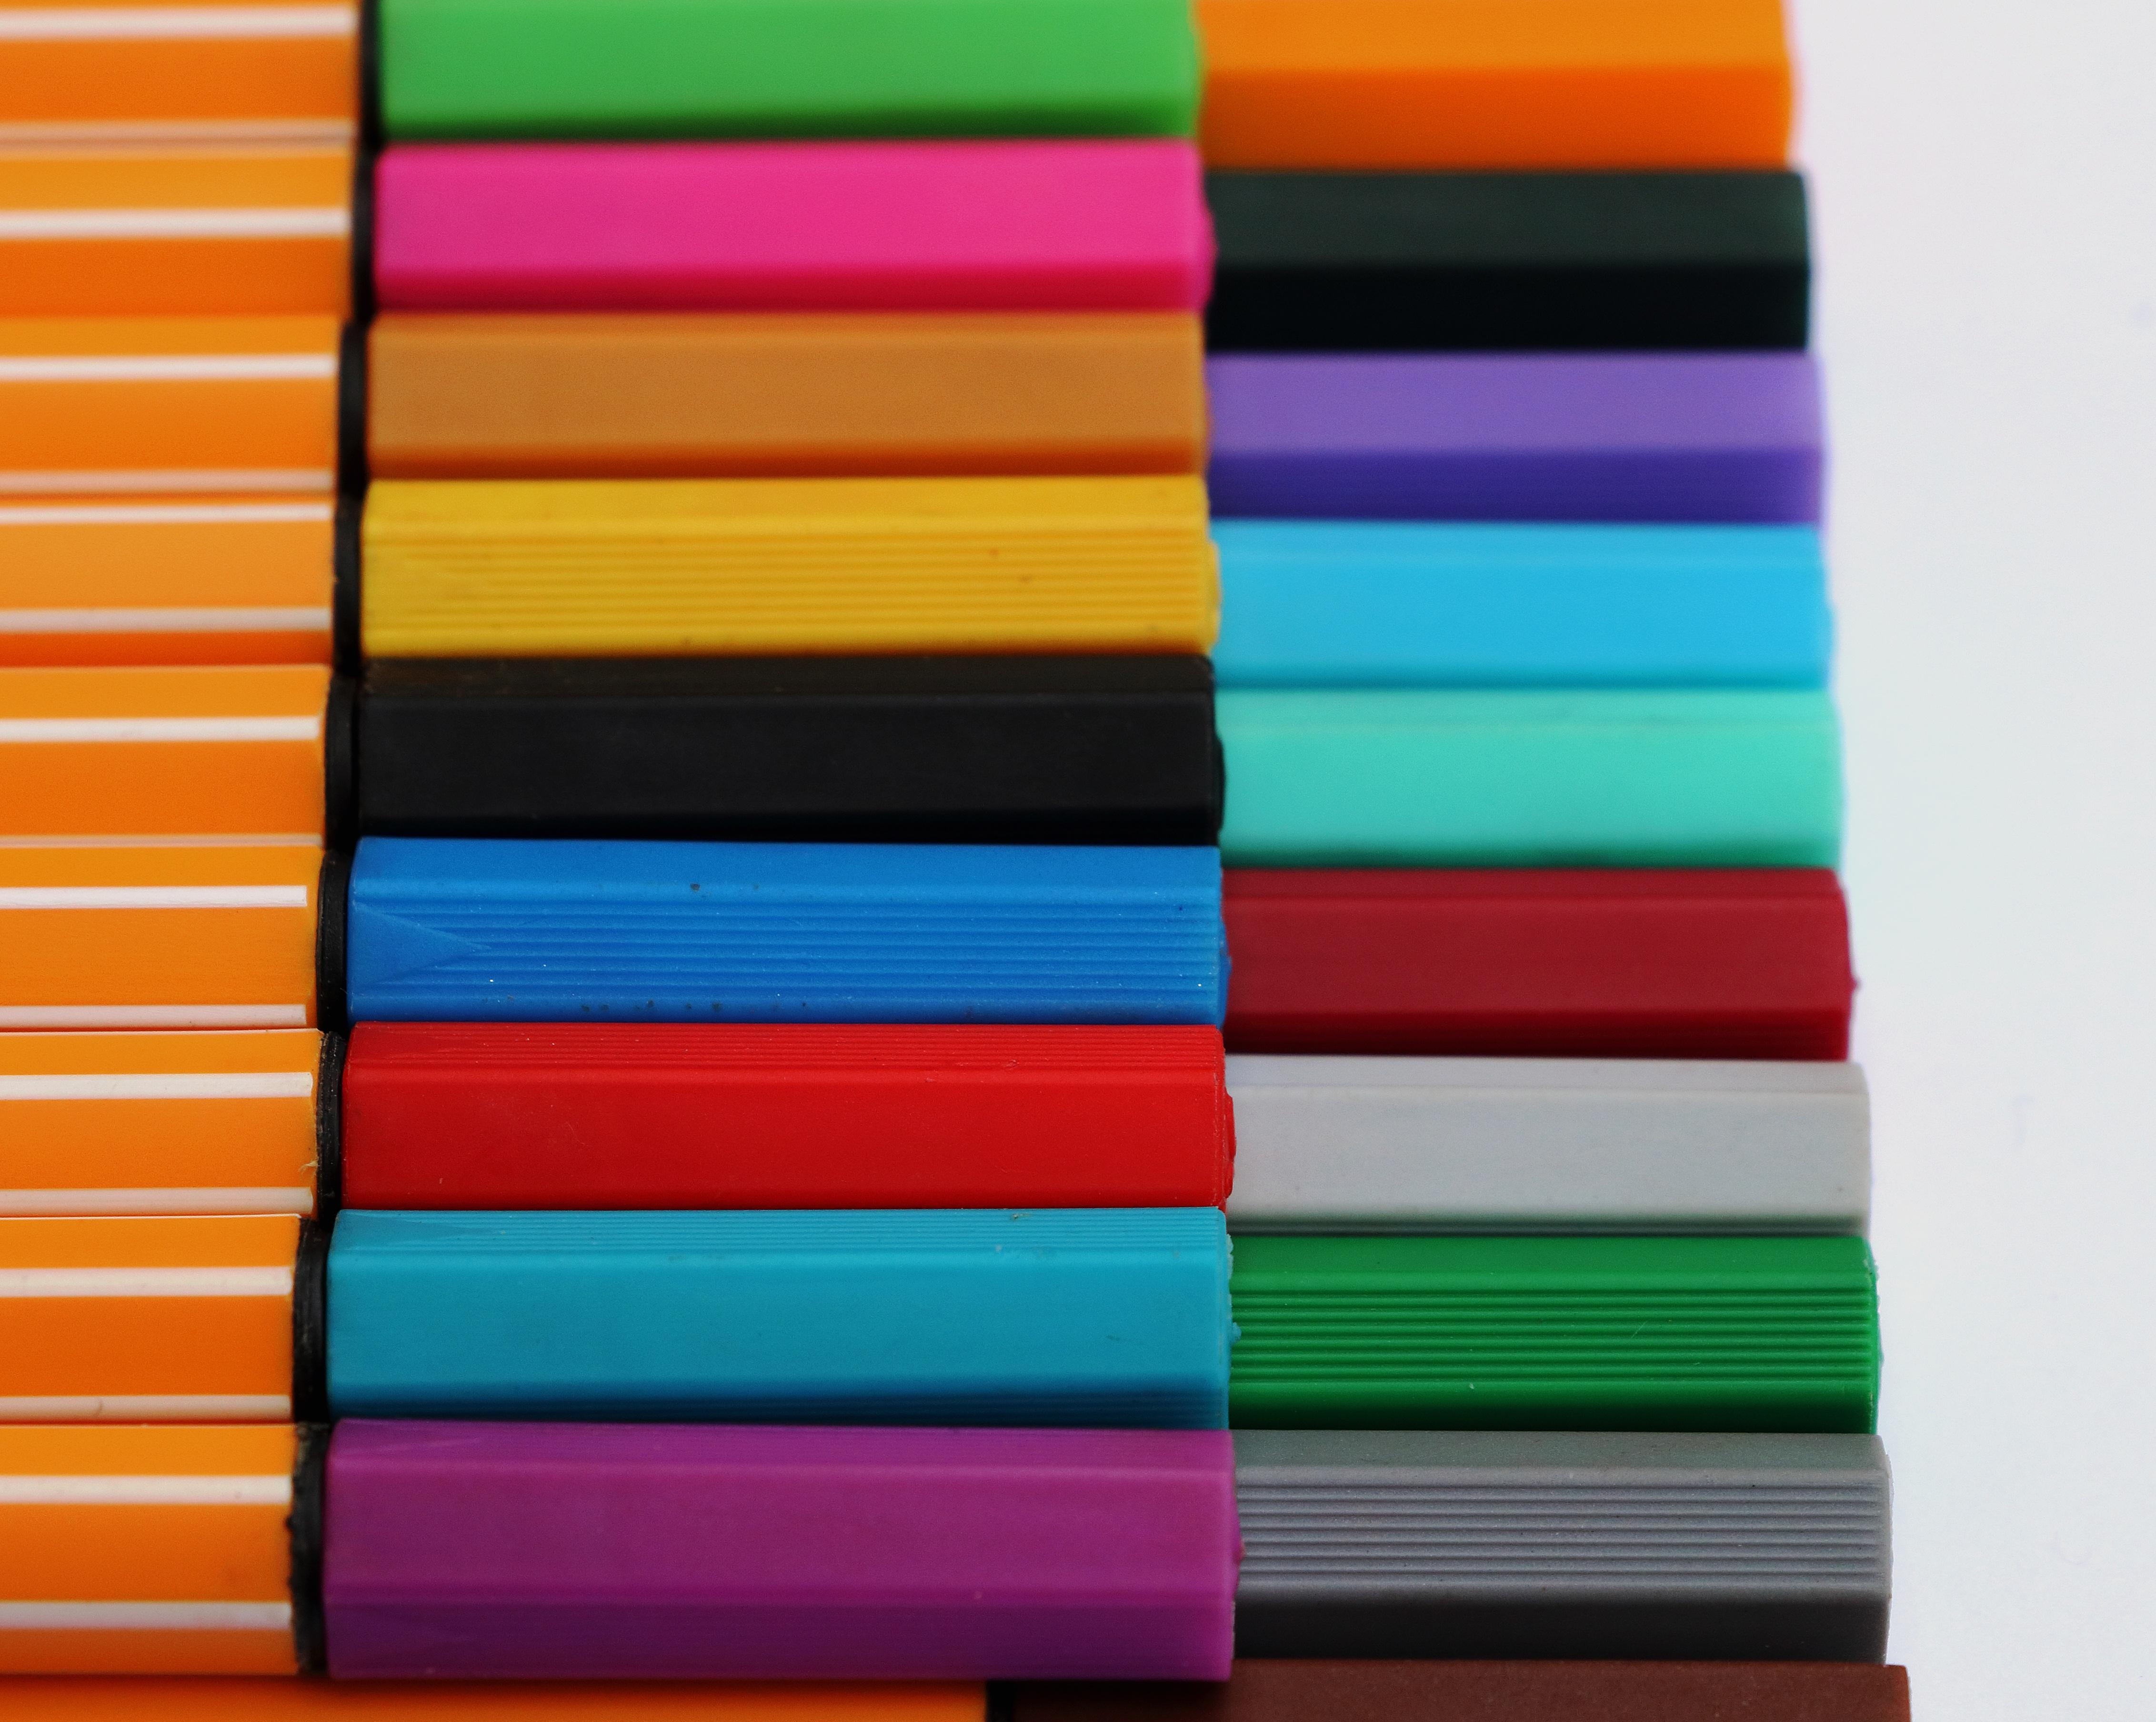 lnea color pintar vistoso pintura textil art pintor plumas magenta dibujar salir lpices de colores colores